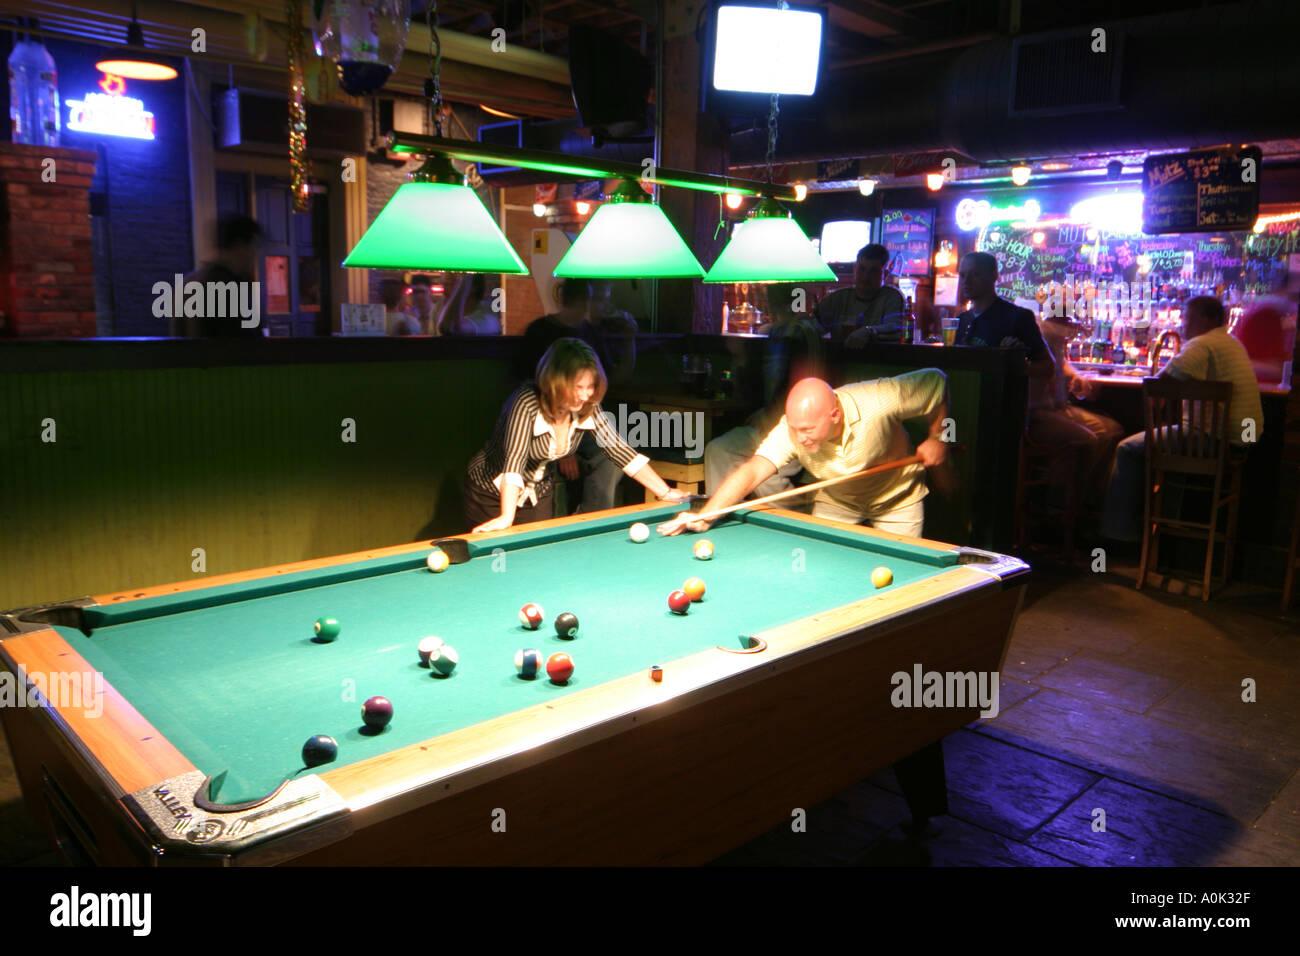 Toledo Ohio Oliver House Bar Nightlife Billiards Pool Table Stock - Pool table and bar near me